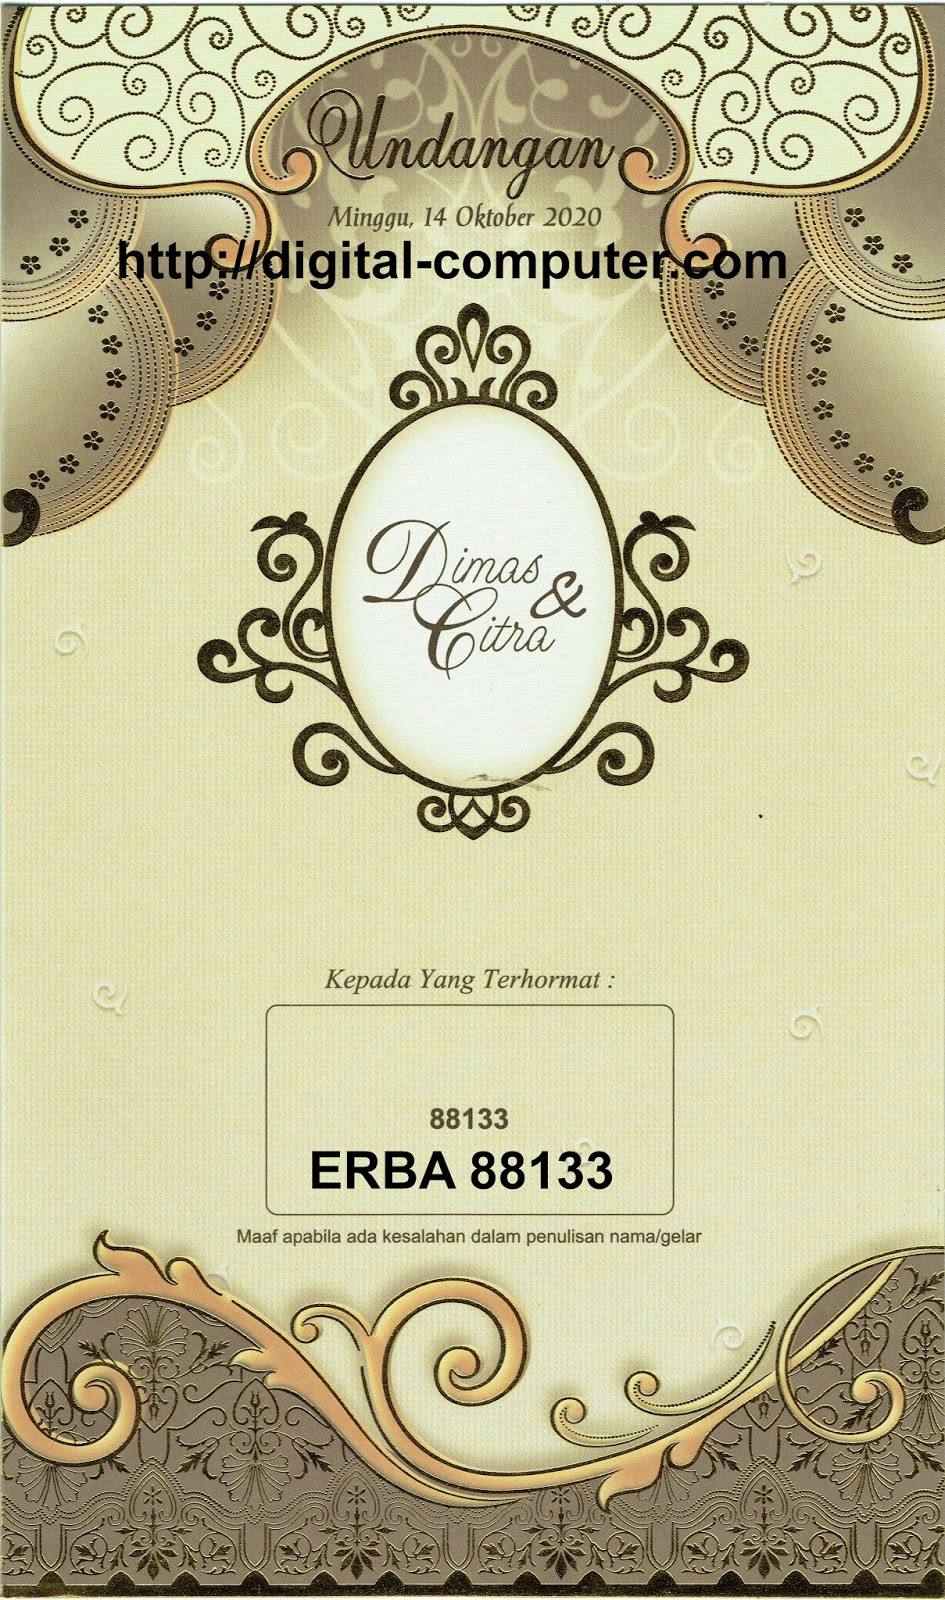 Undangan Softcover ERBA 88133